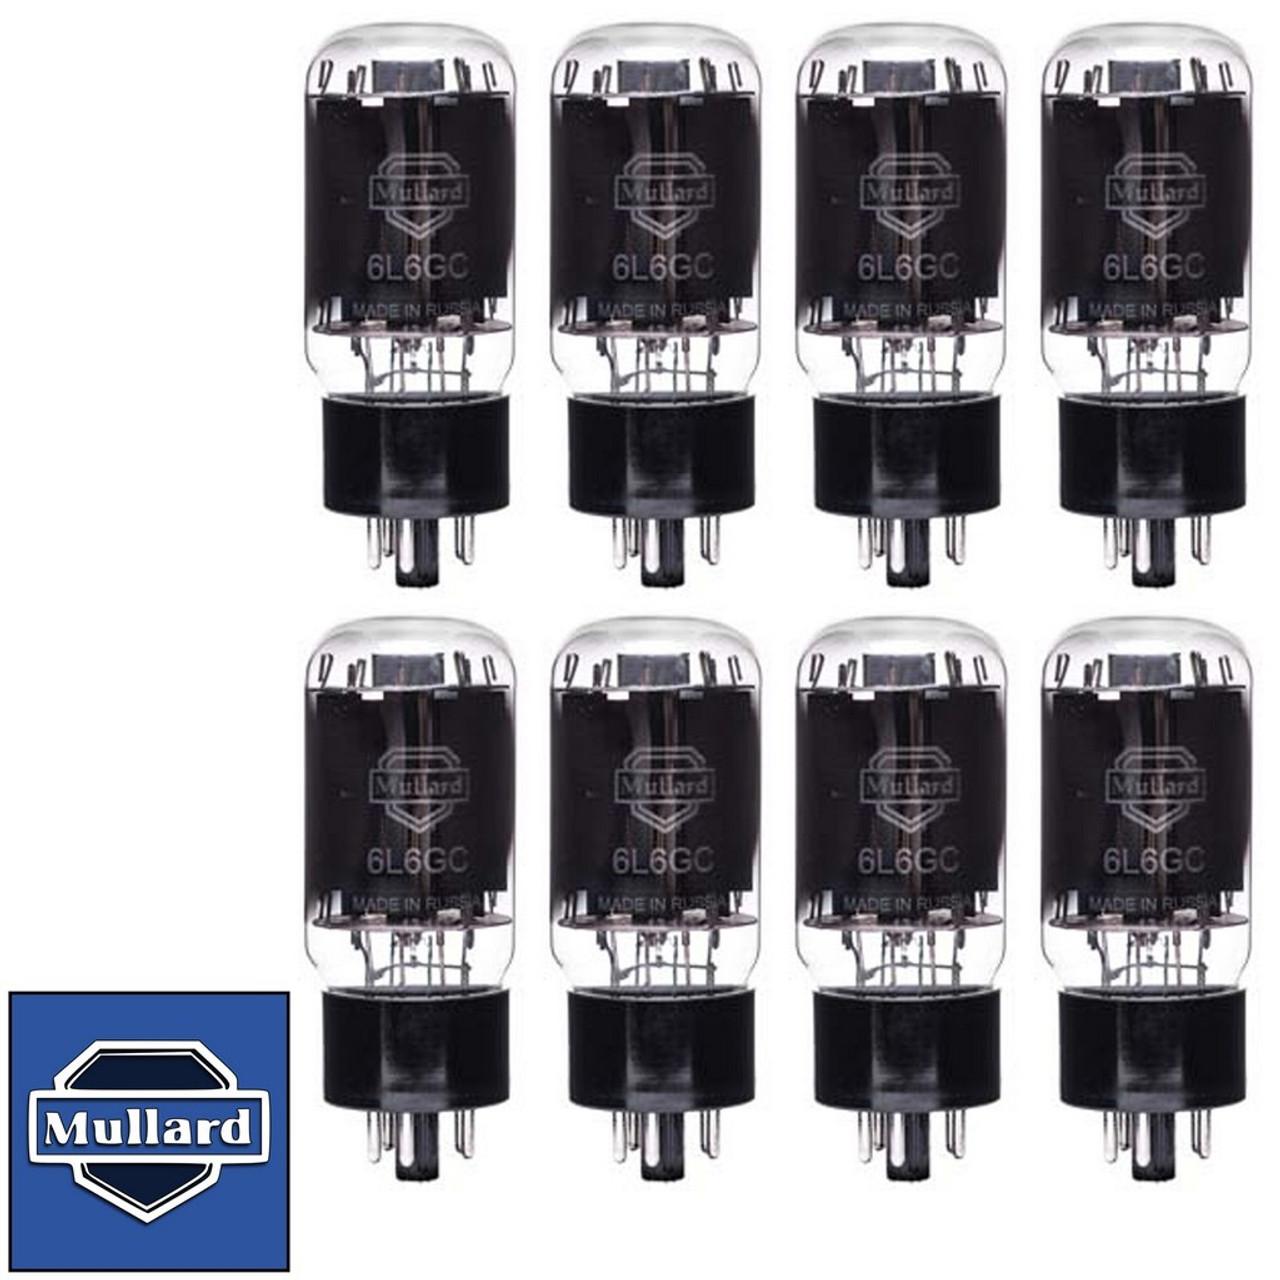 Brand New In Box Mullard Reissue 6L6GC 6L6 Current Matched Pair Vacuum Tubes 2